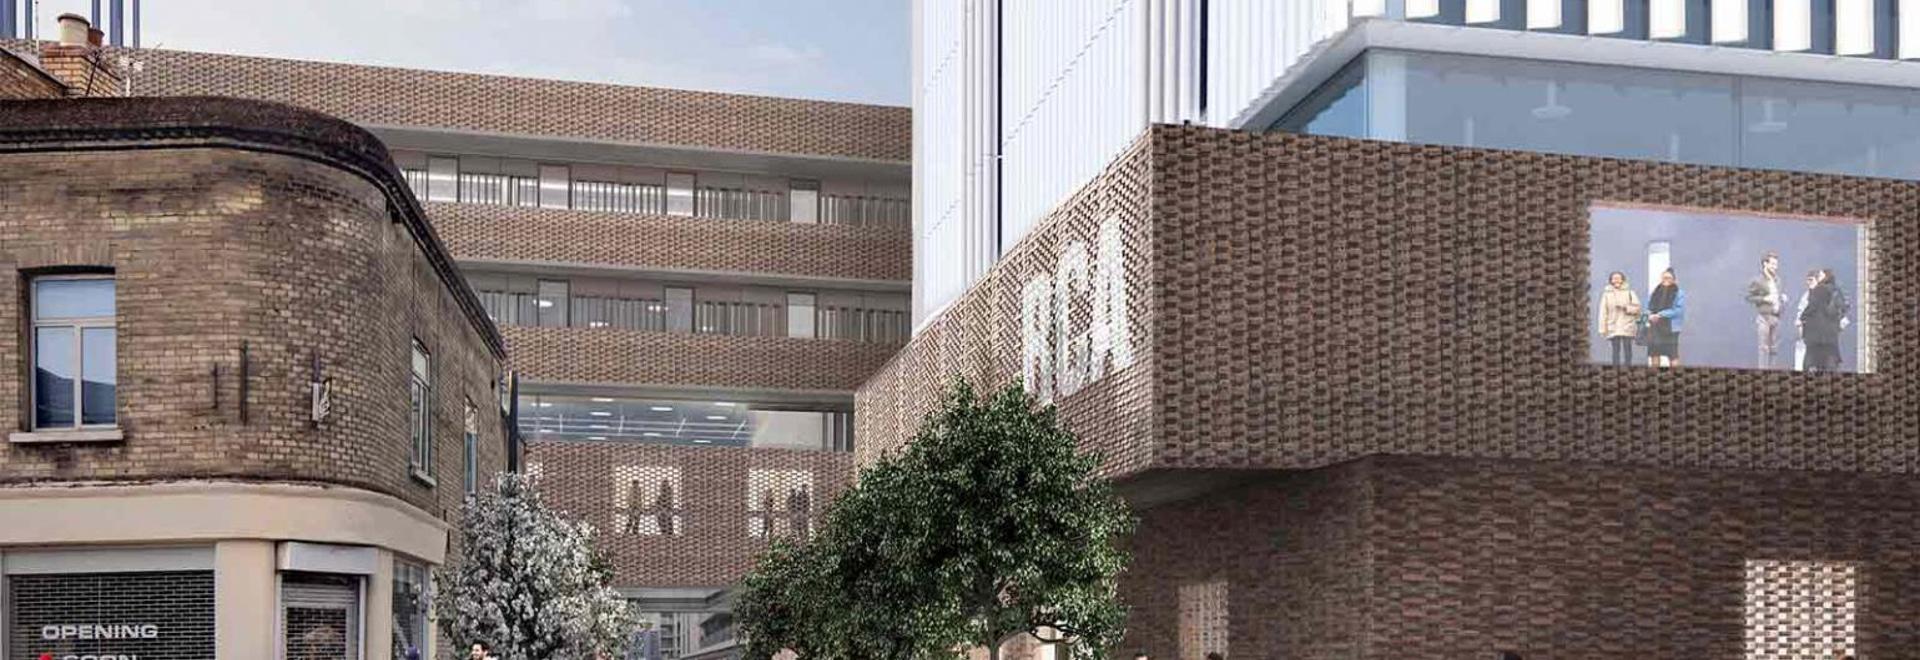 The new RCA Battersea Building designed by Herzog & de Meuron scheduled to complete by 2020. Image: © Herzog & de Meuron